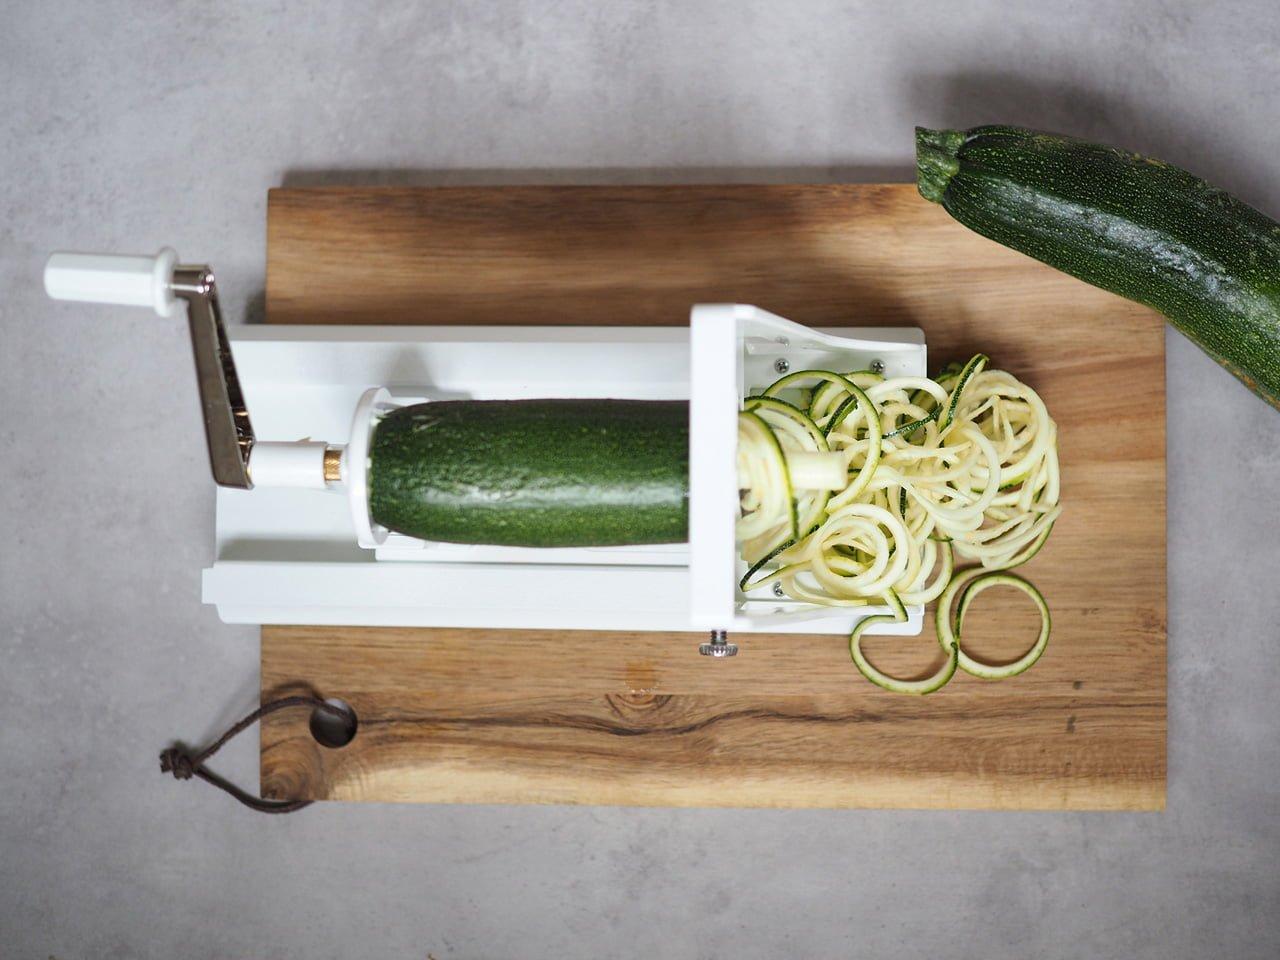 zoodles med grönsakssvarv cervera